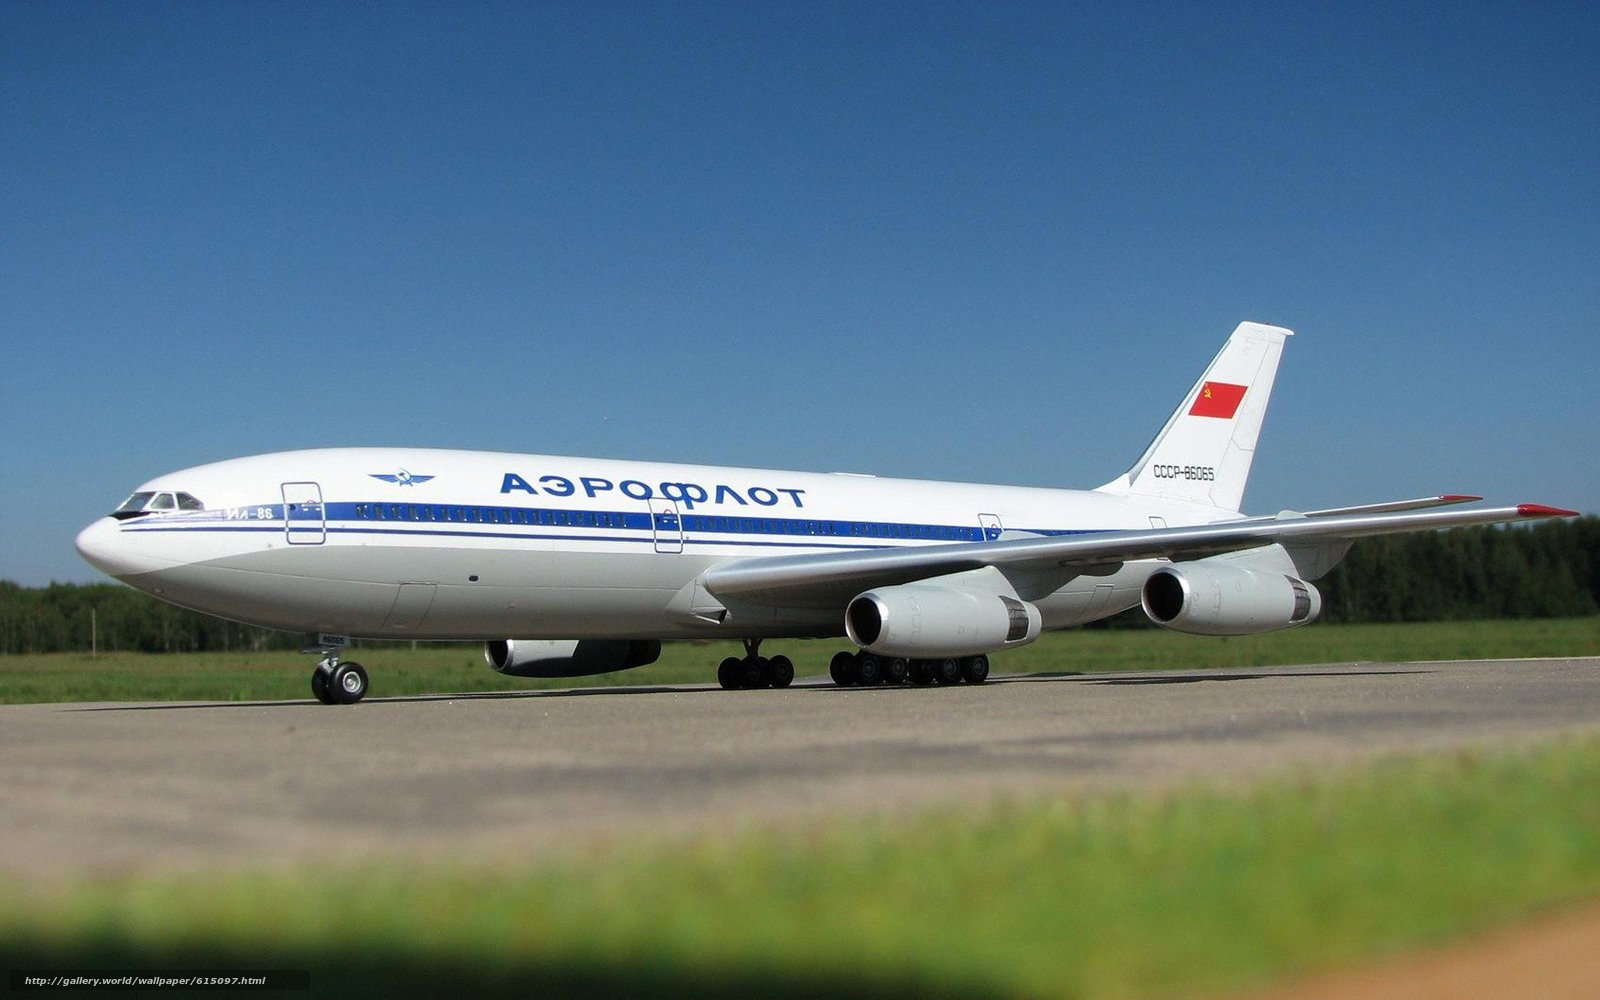 самолёт, ИЛ-86, Аэрофлот, СССР